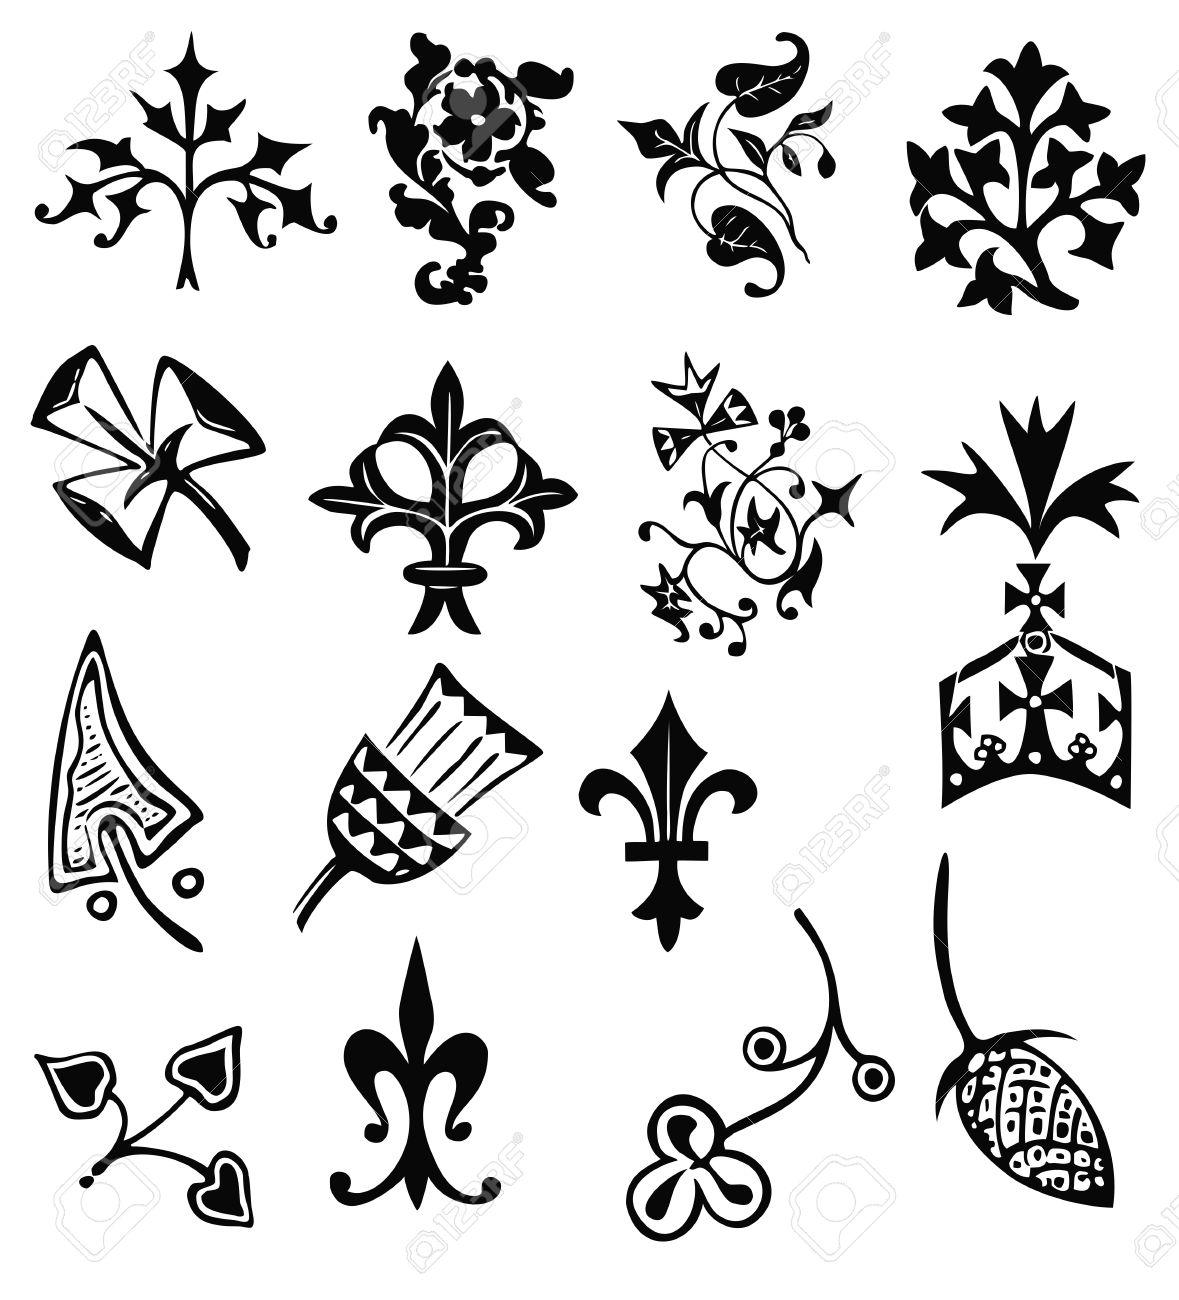 936 Dingbat Stock Illustrations, Cliparts And Royalty Free Dingbat.